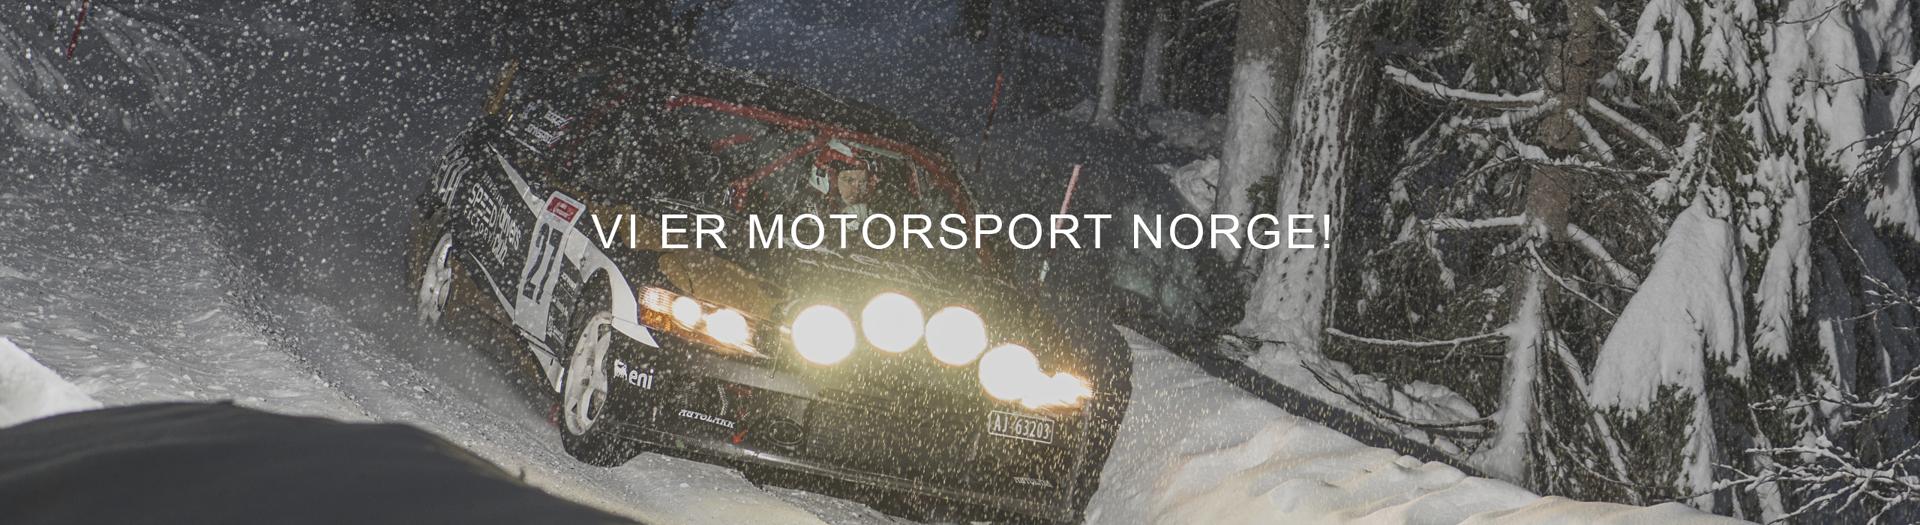 karusellbilde Hero vinter vi er motorsport norge 223.png